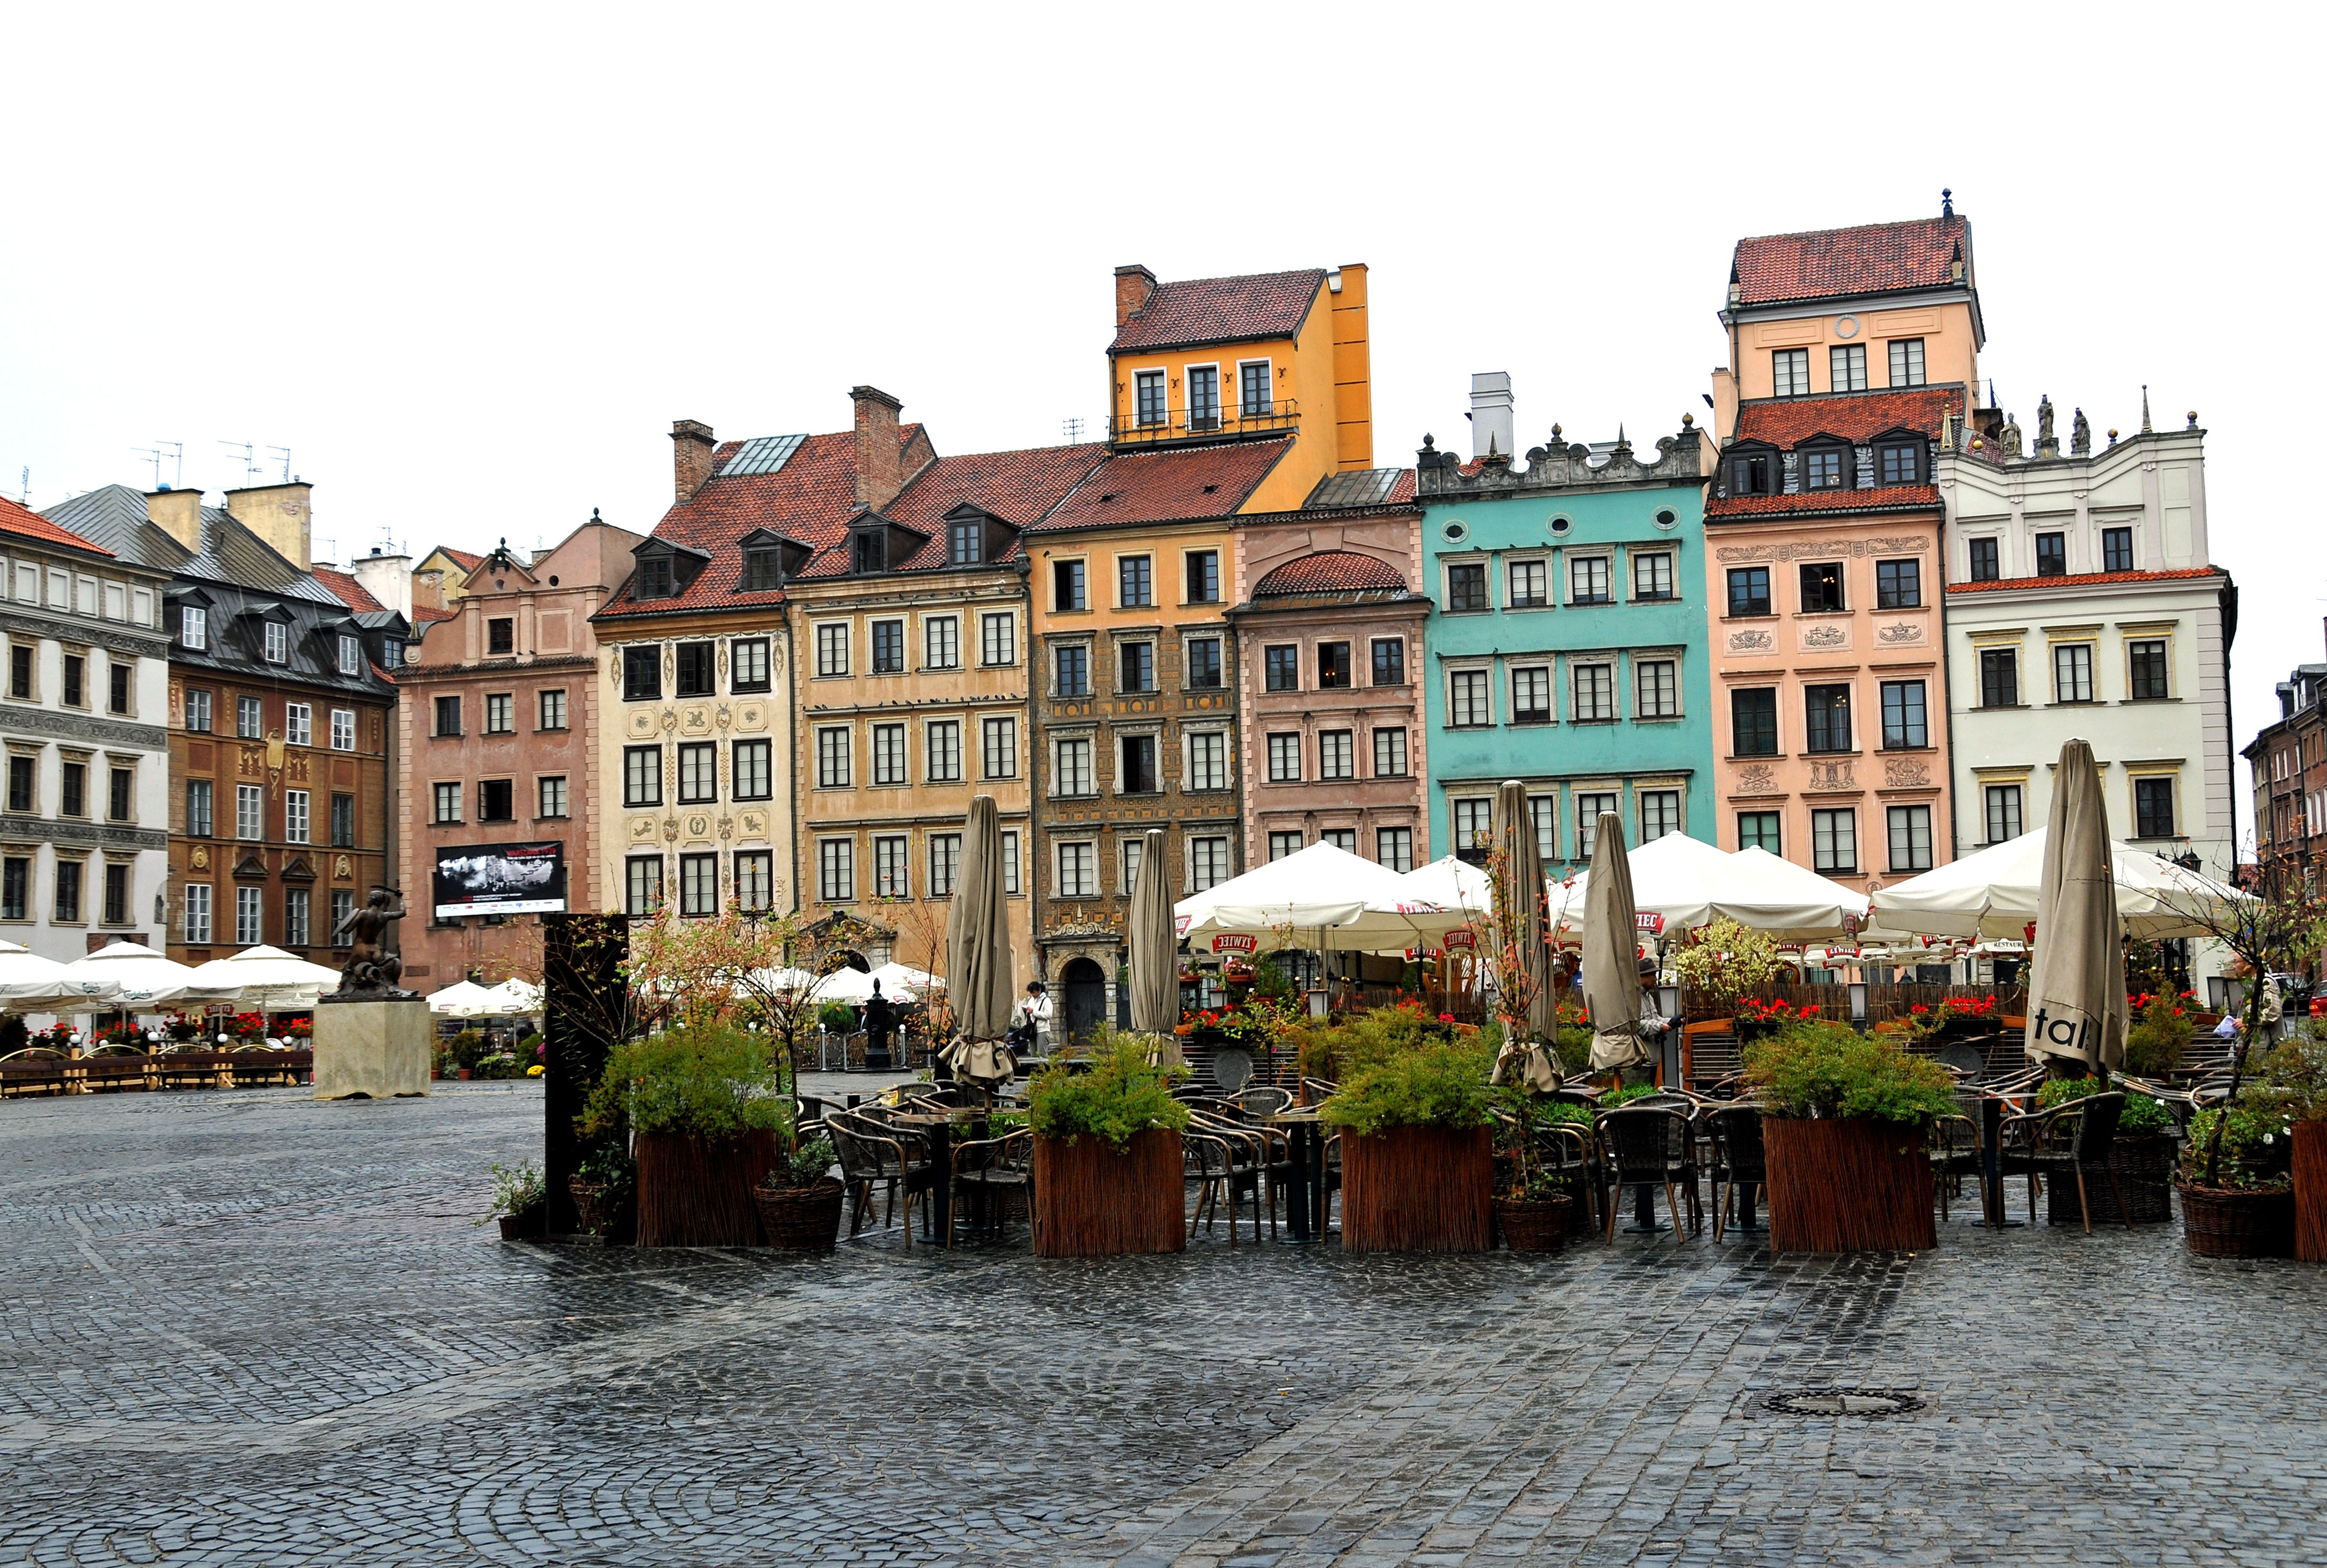 Warsaw_4198069910_386b5bf2bd_o.jpg (4338×2923)